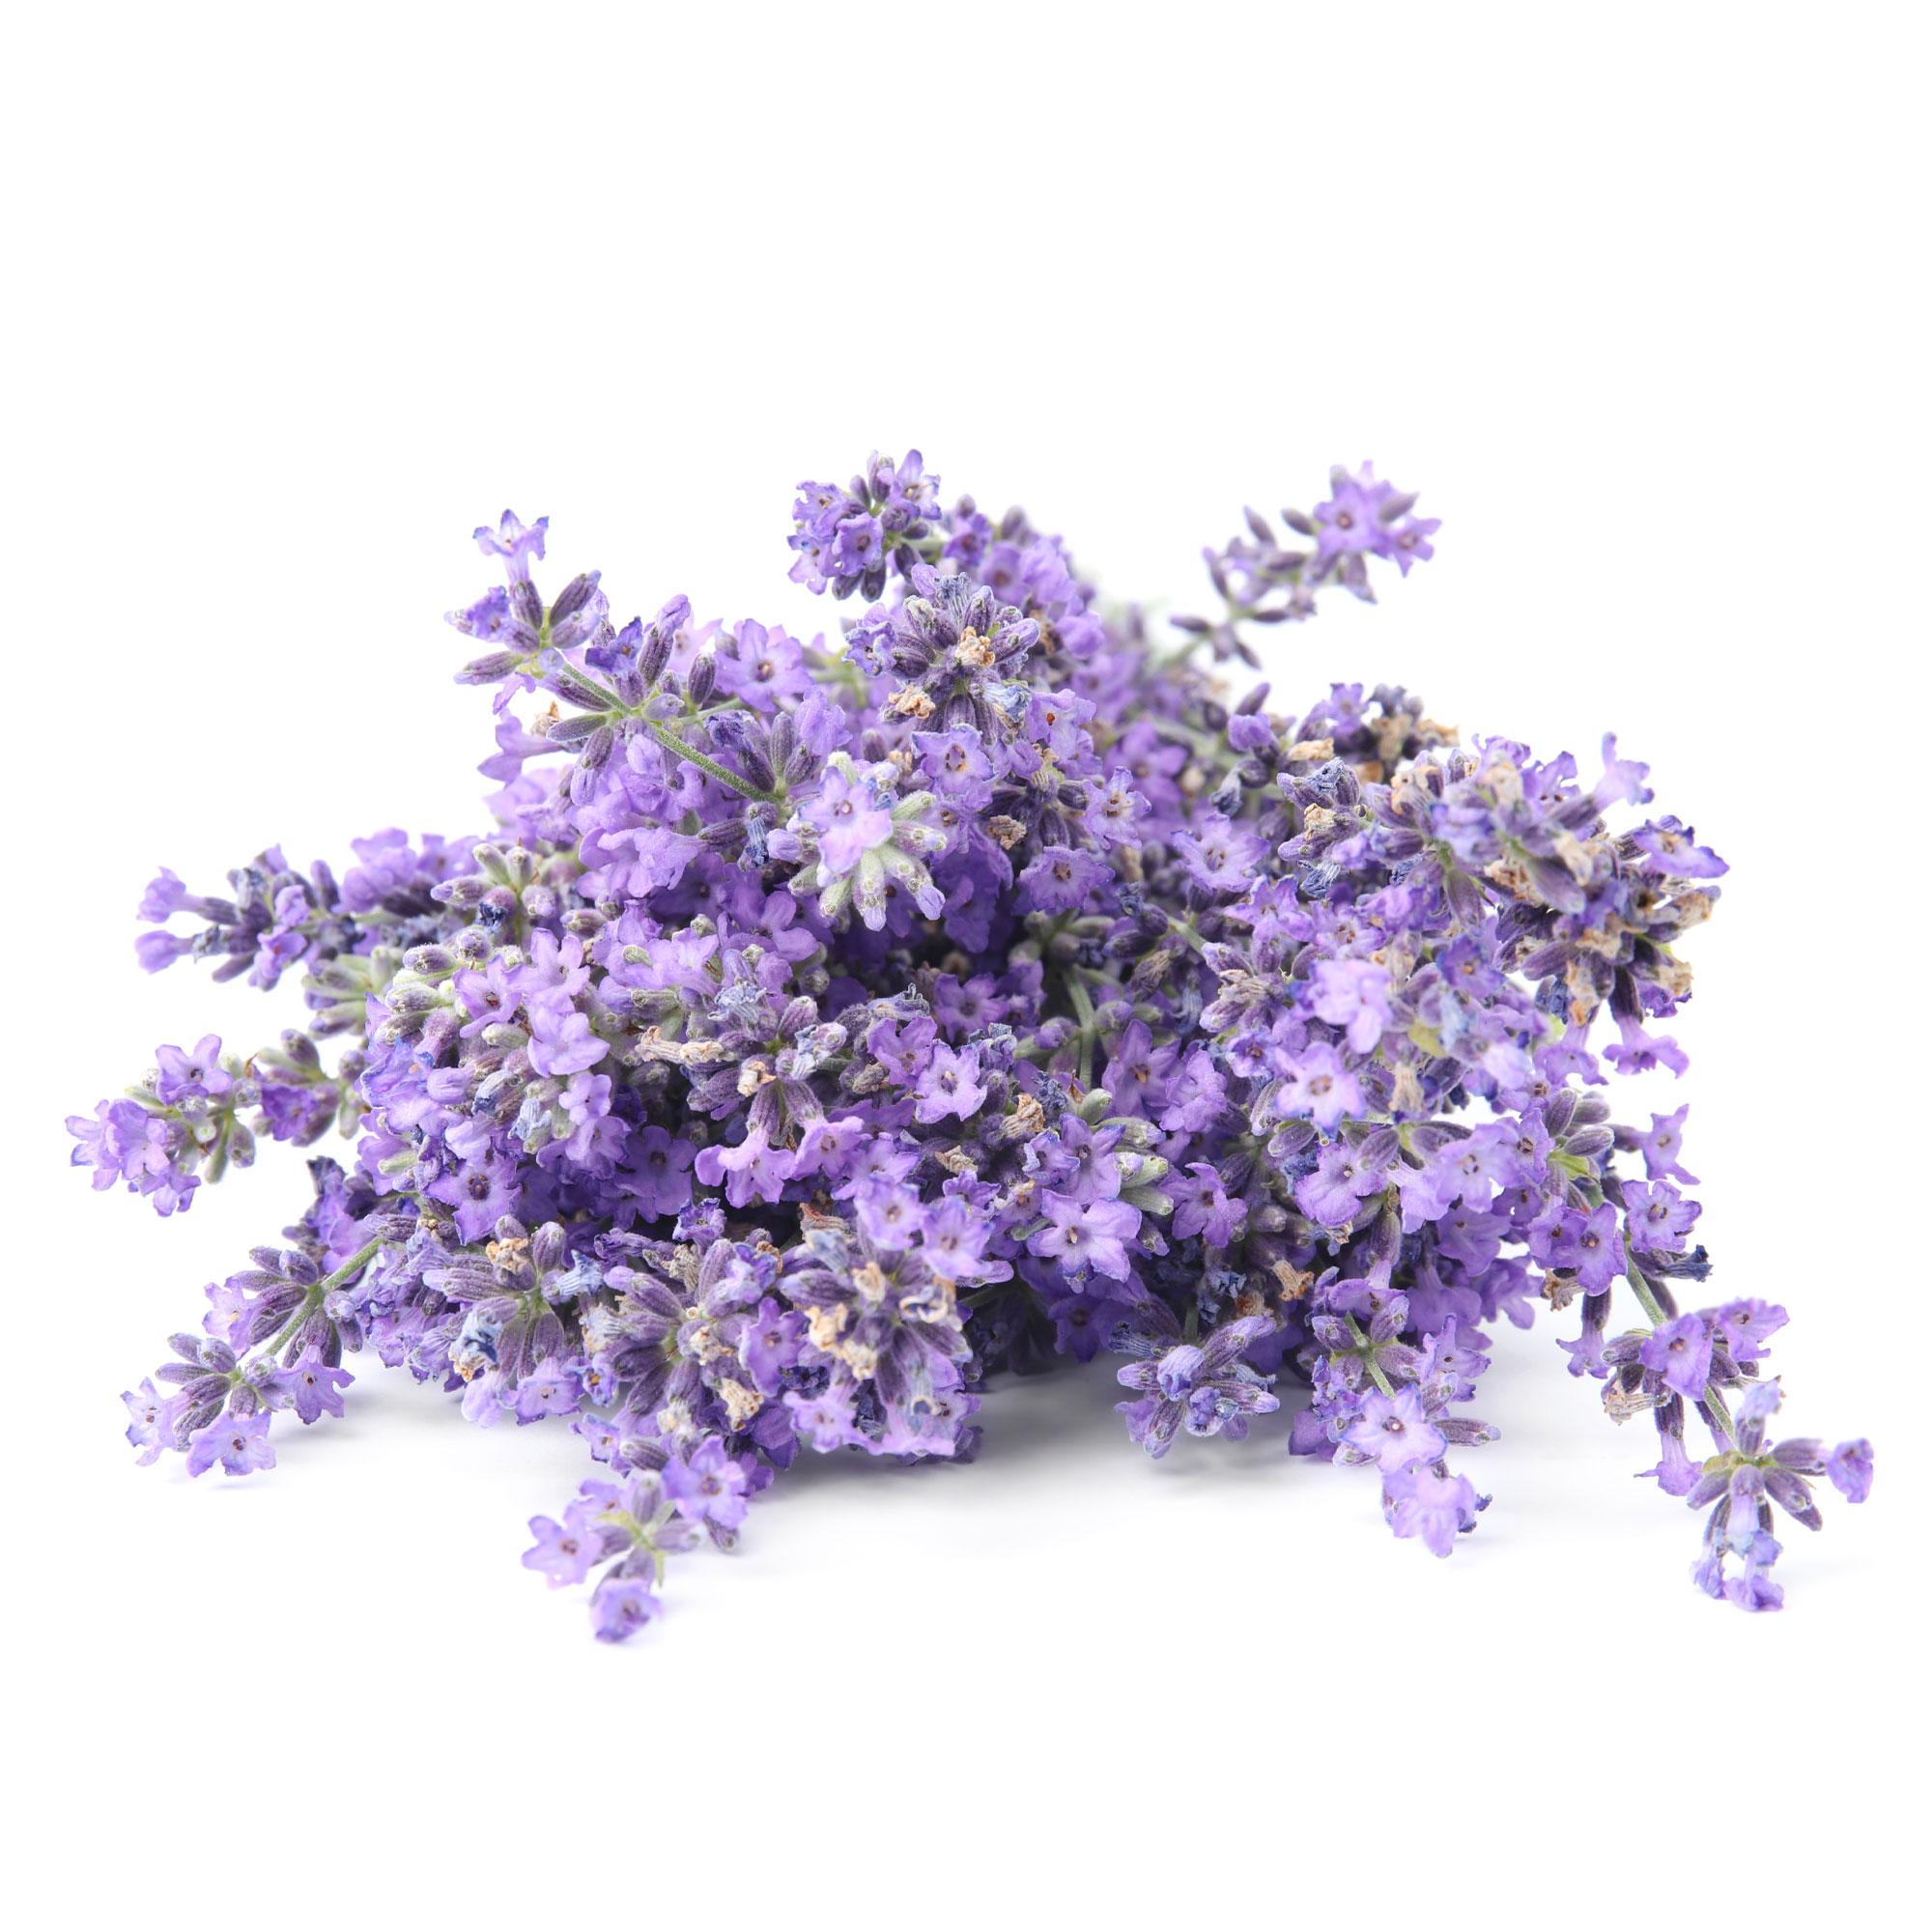 Lavender Scent Ingredients